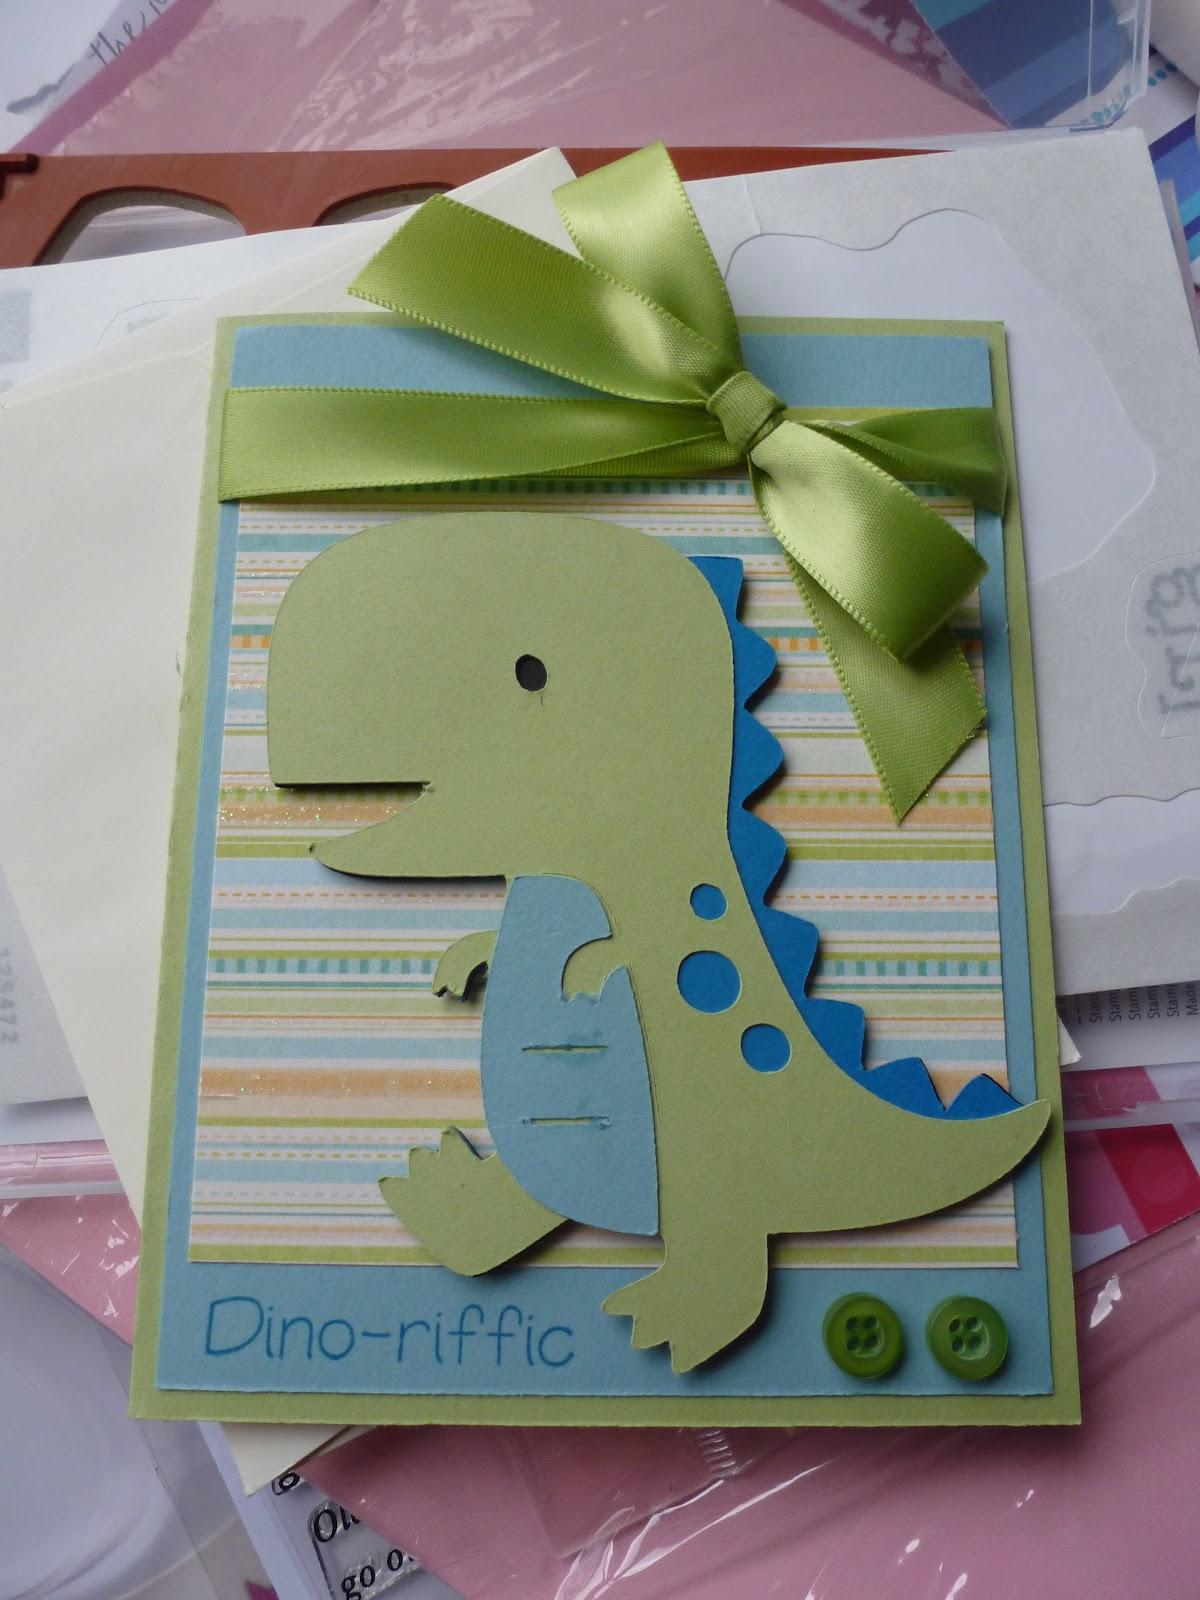 Dinosaur Baby Shower Invitation Dolanpedia Invitations Ideas Free - Free Printable Dinosaur Baby Shower Invitations